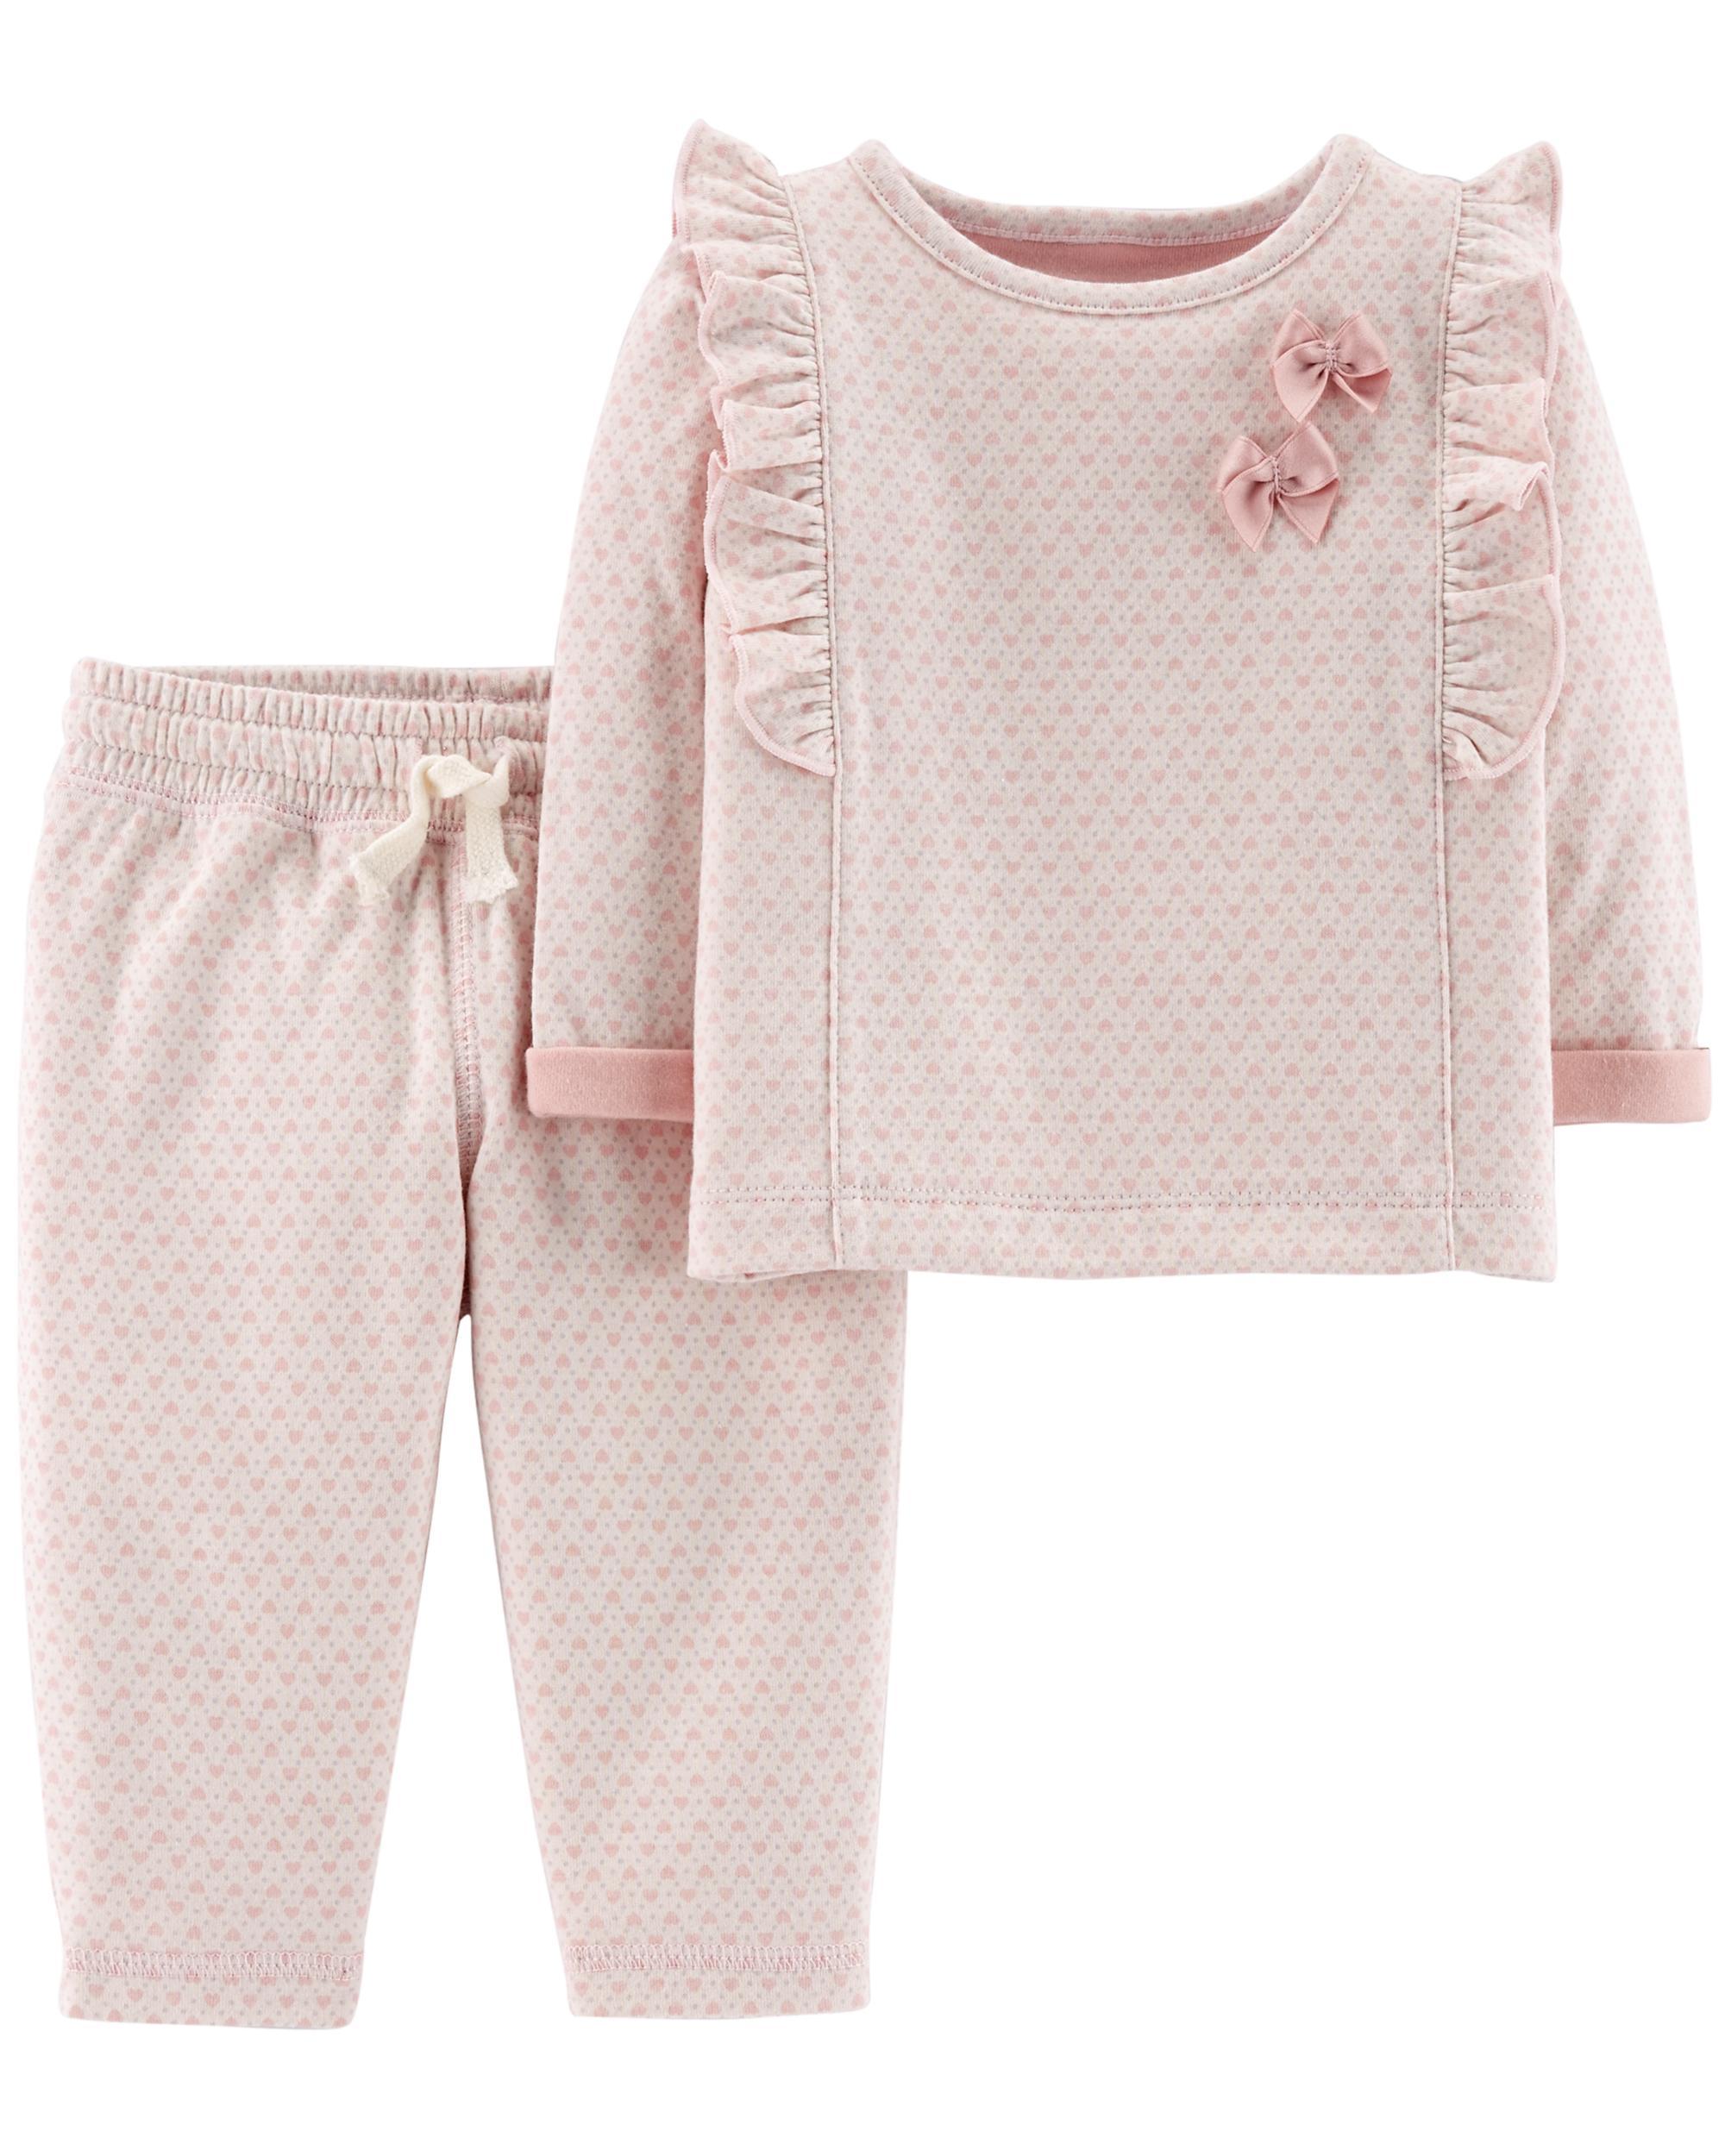 Baby Carters 2 Piece PJ Set